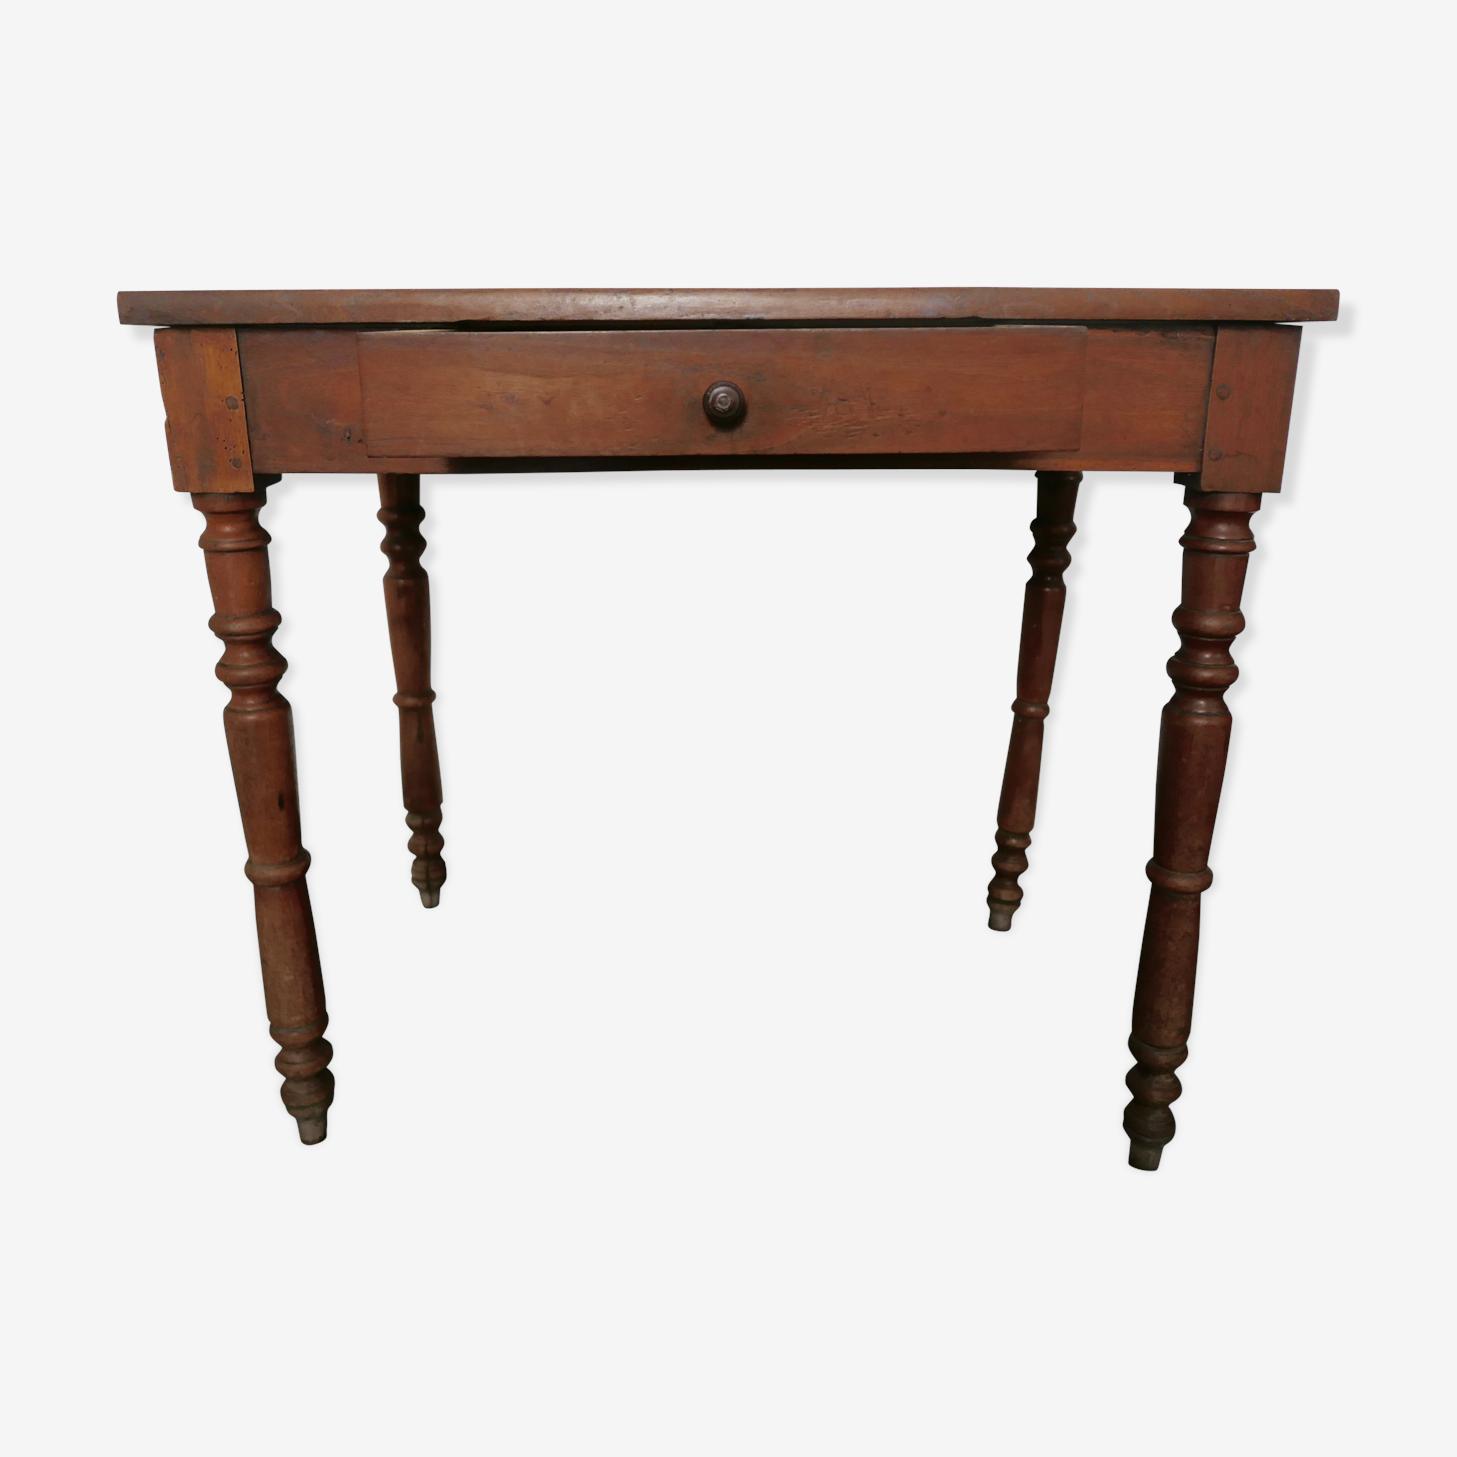 Table d'appoint en chêne avec tiroir